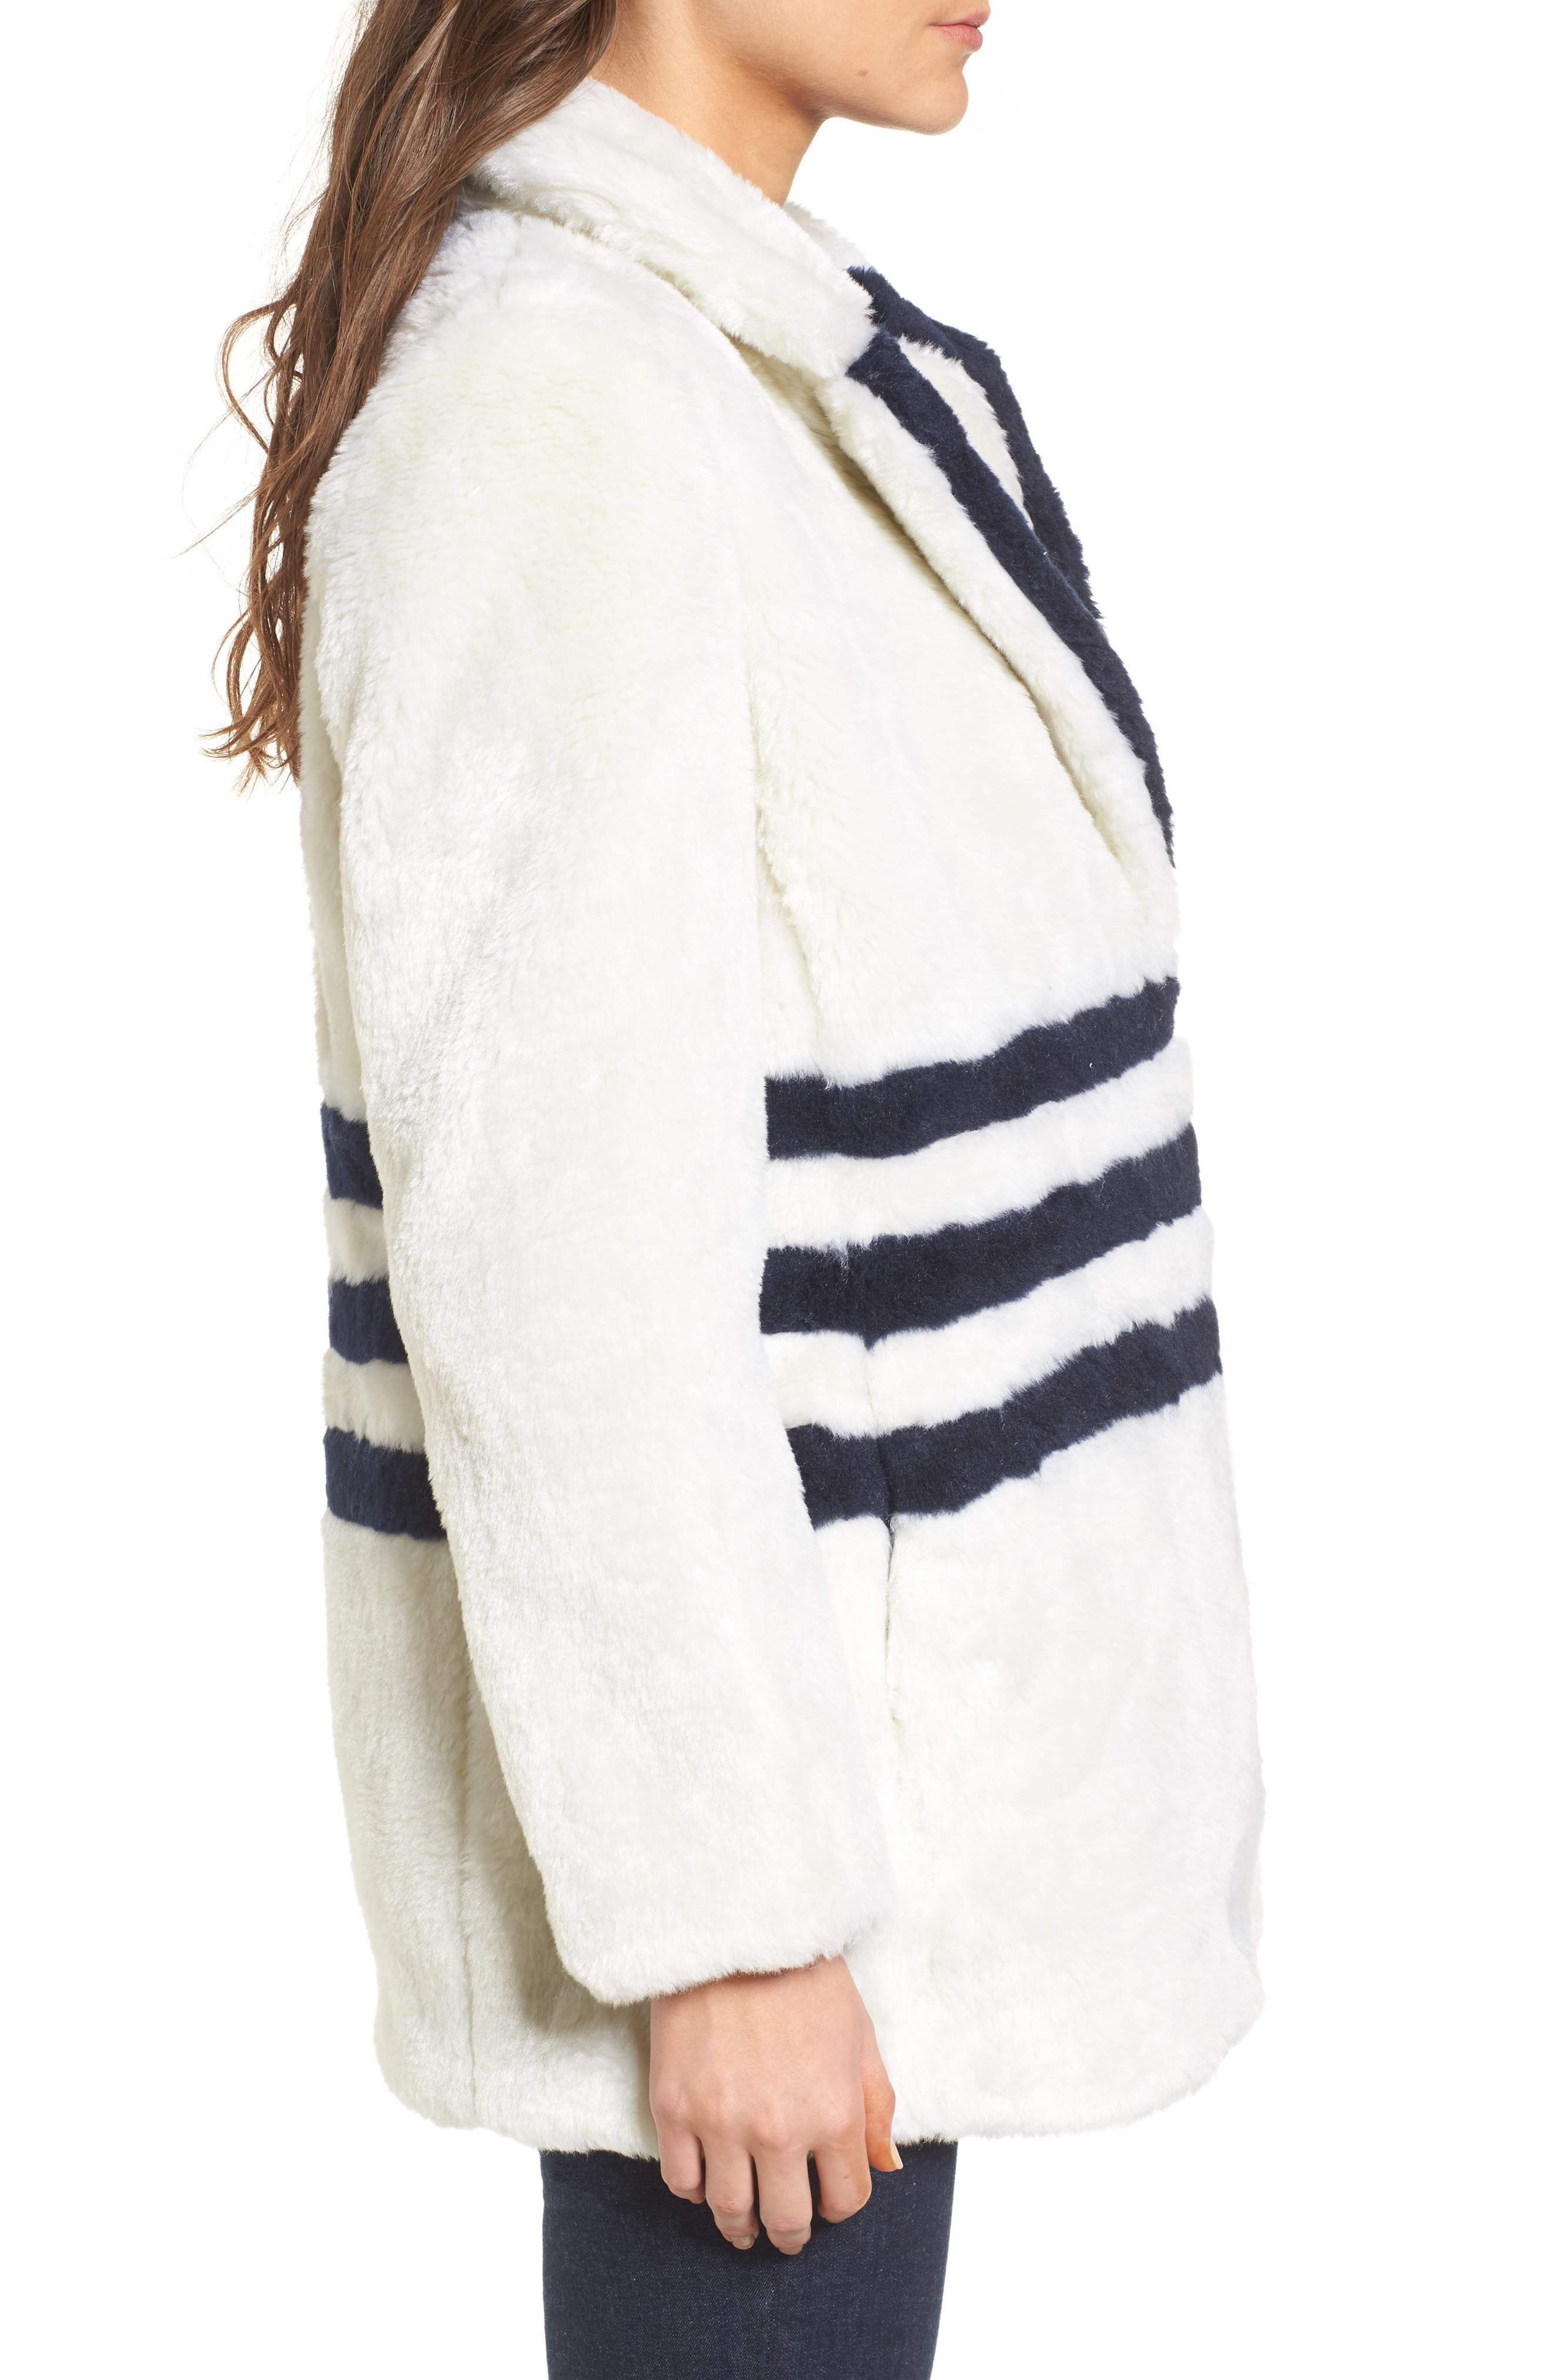 J.Crew Yuna Teddy Faux Fur Jacket,                             Alternate thumbnail 3, color,                             Ivory/ Navy